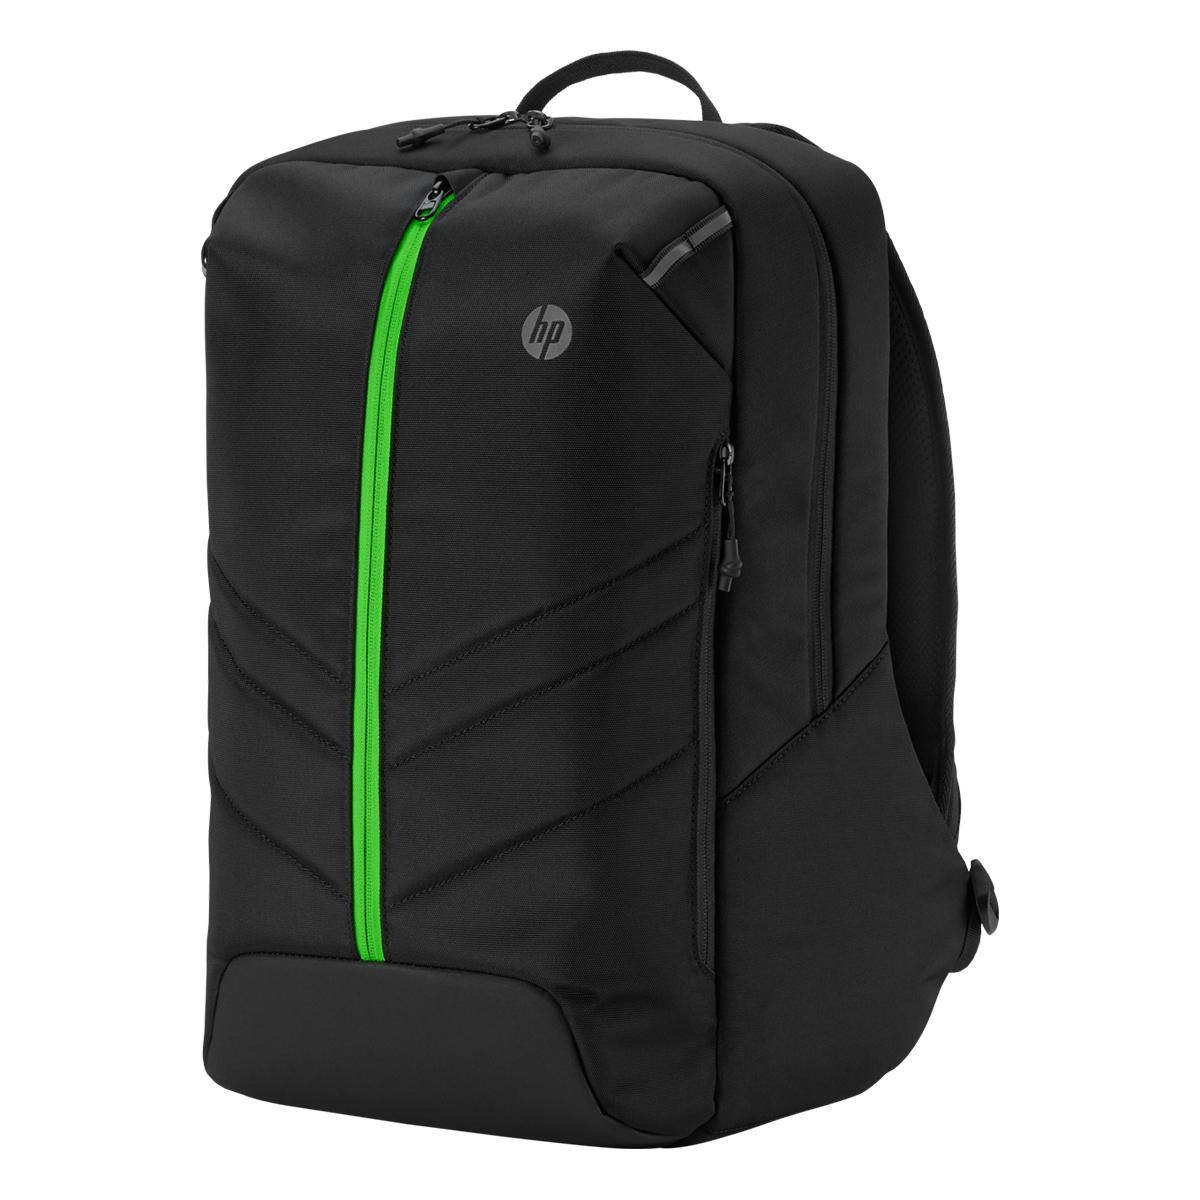 HP Pavilion 17-inch 500 Backpack - 6EU58AA